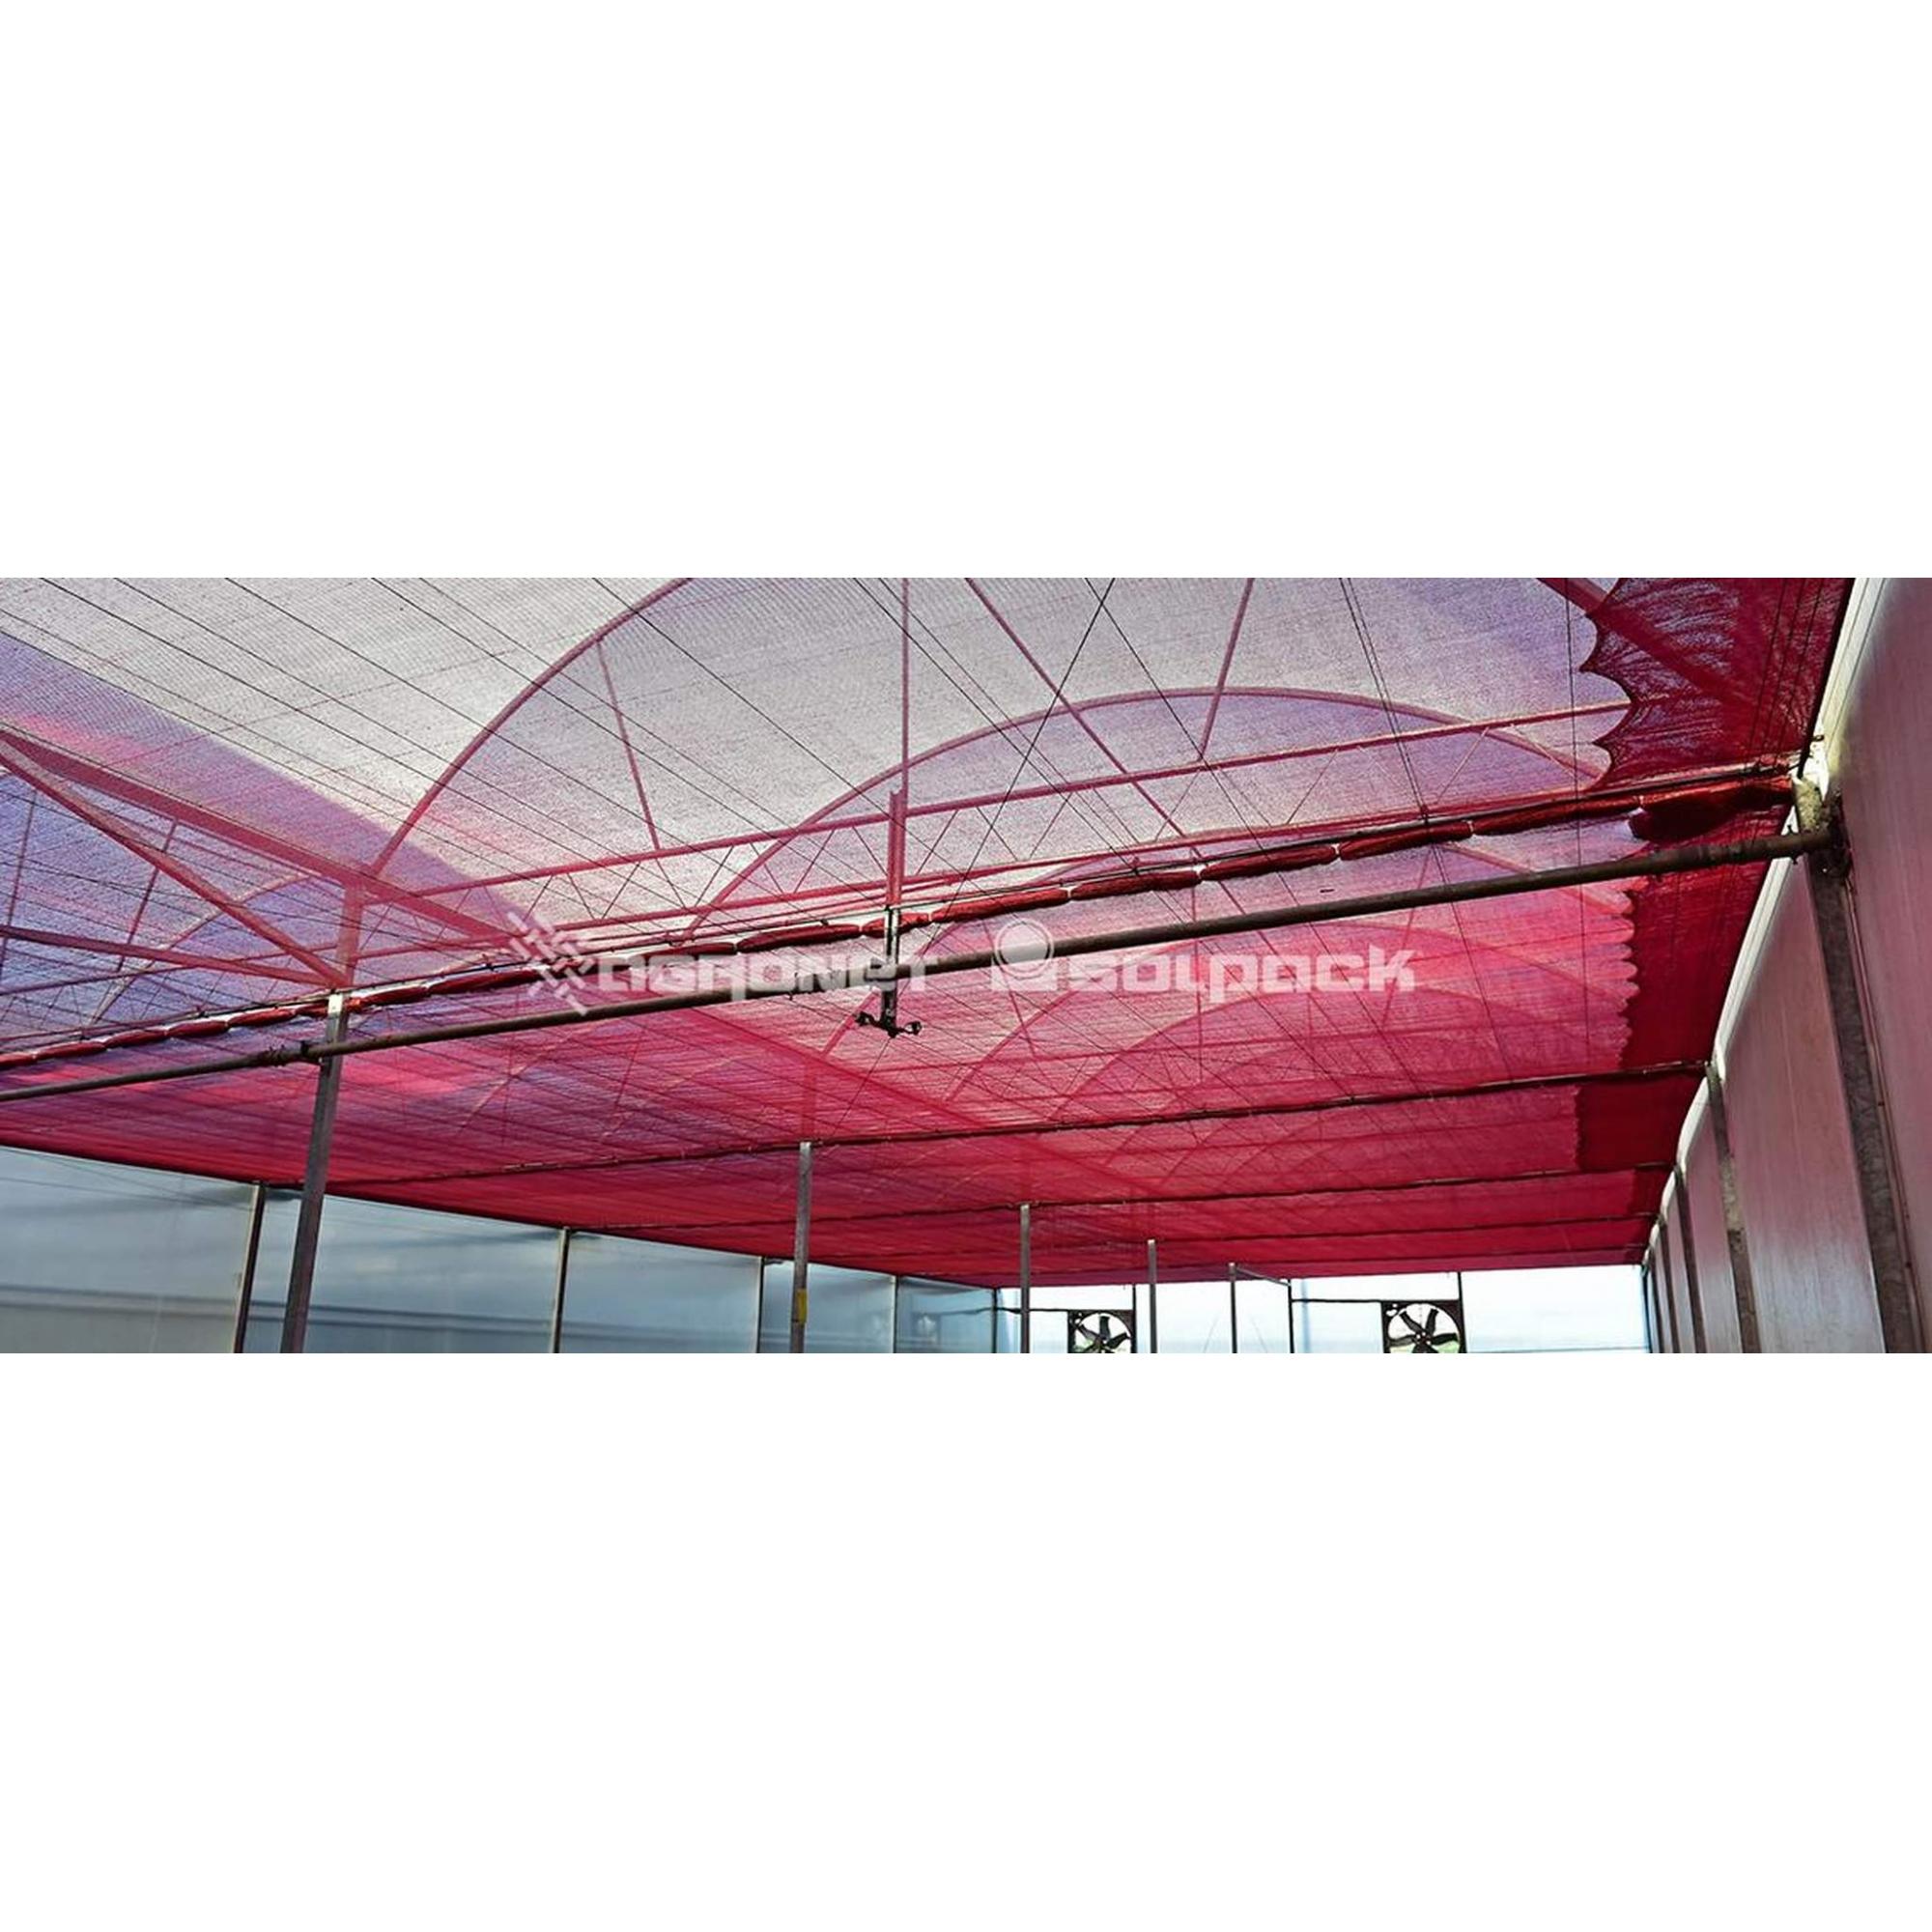 Tela de Sombreamento Vermelha Ultranet - Largura: 3 Metros